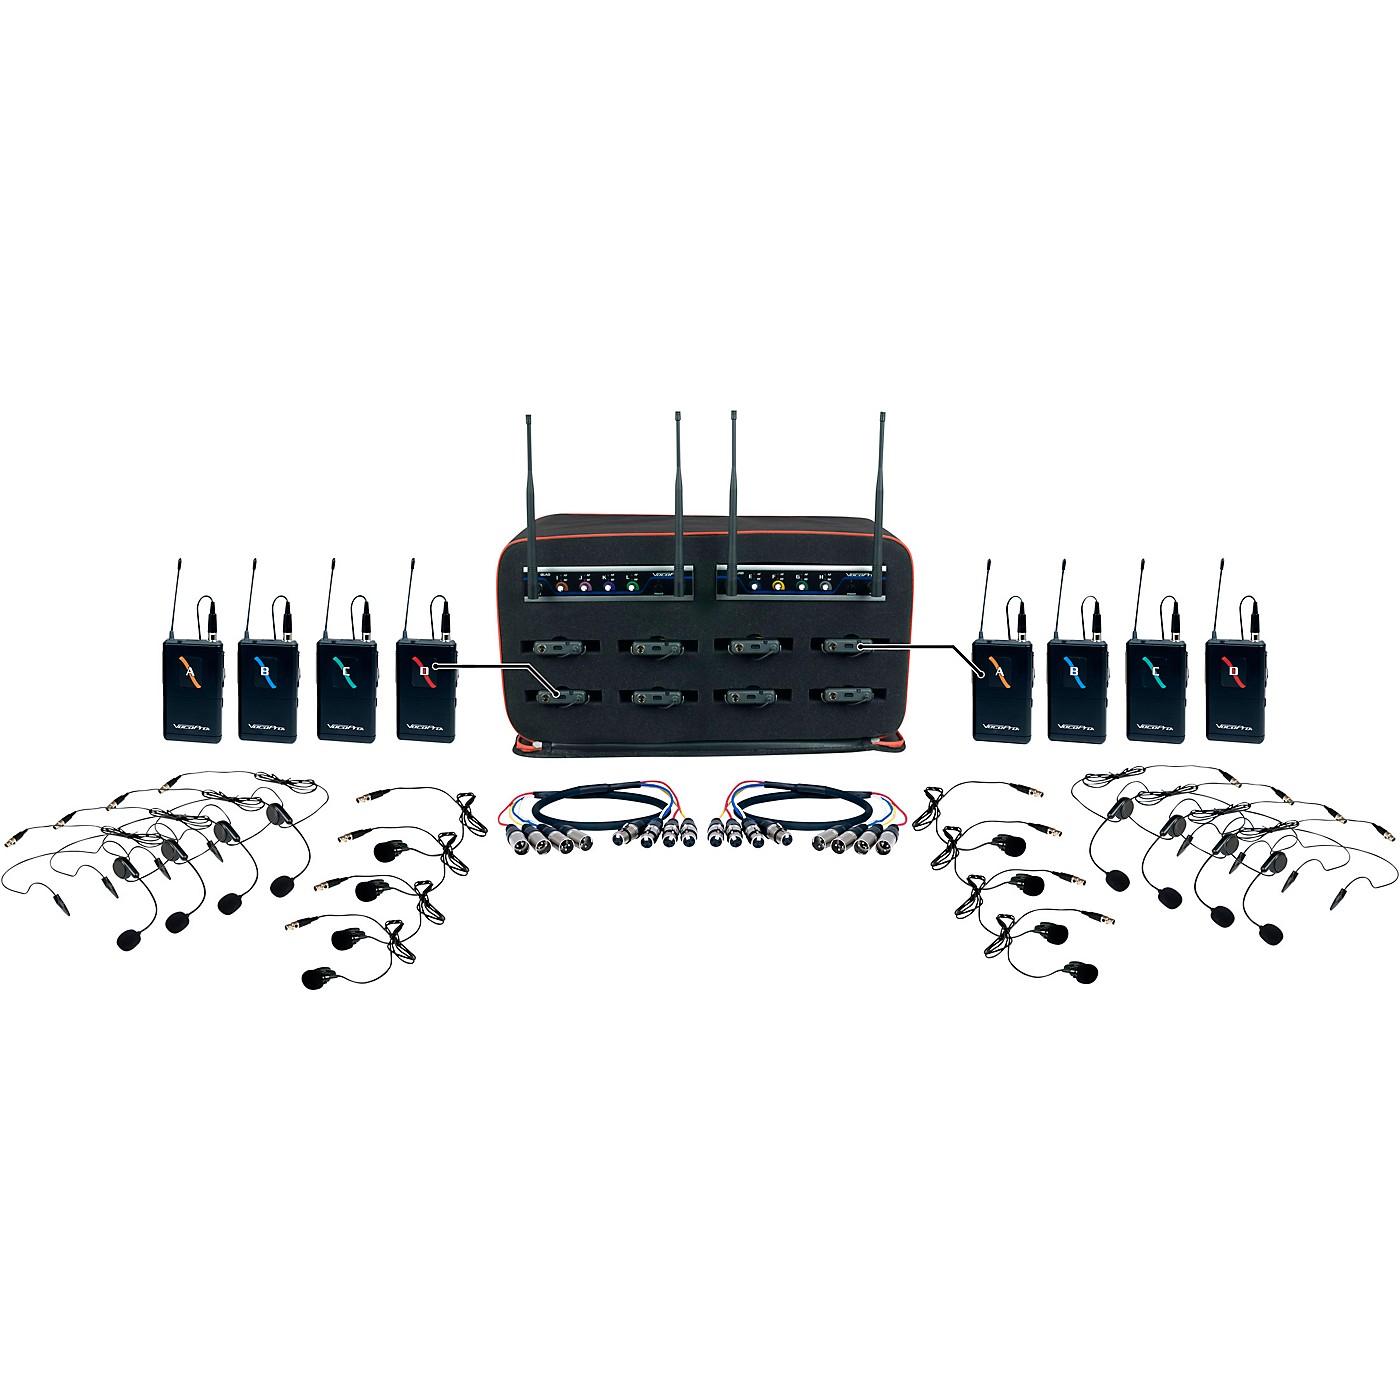 VocoPro 8 Channel Wireless Headset/Lapel Mic-In-Bag Package thumbnail